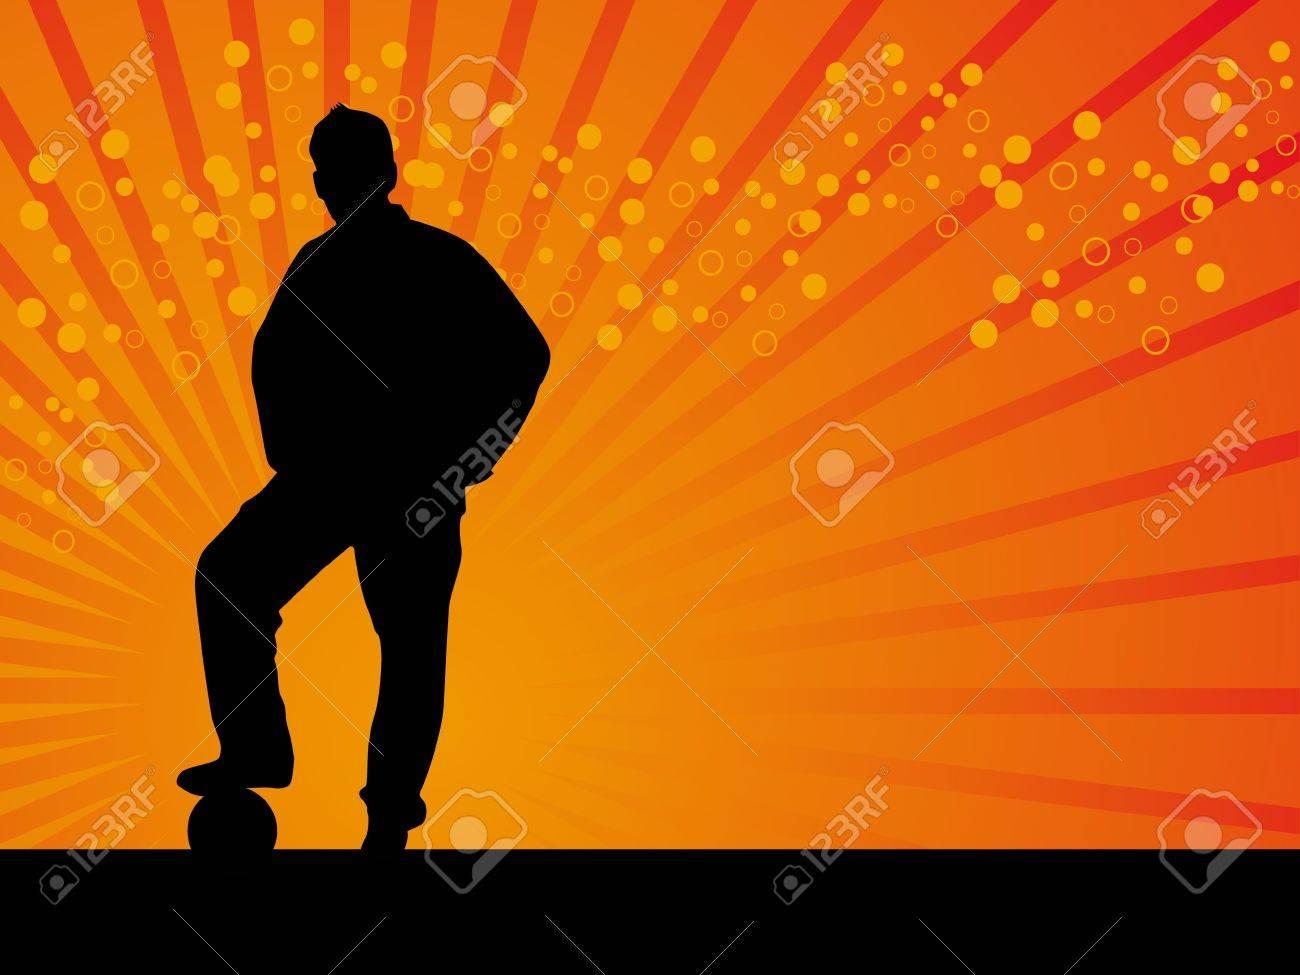 Black man footballer vector background illustration Stock Illustration - 2200564